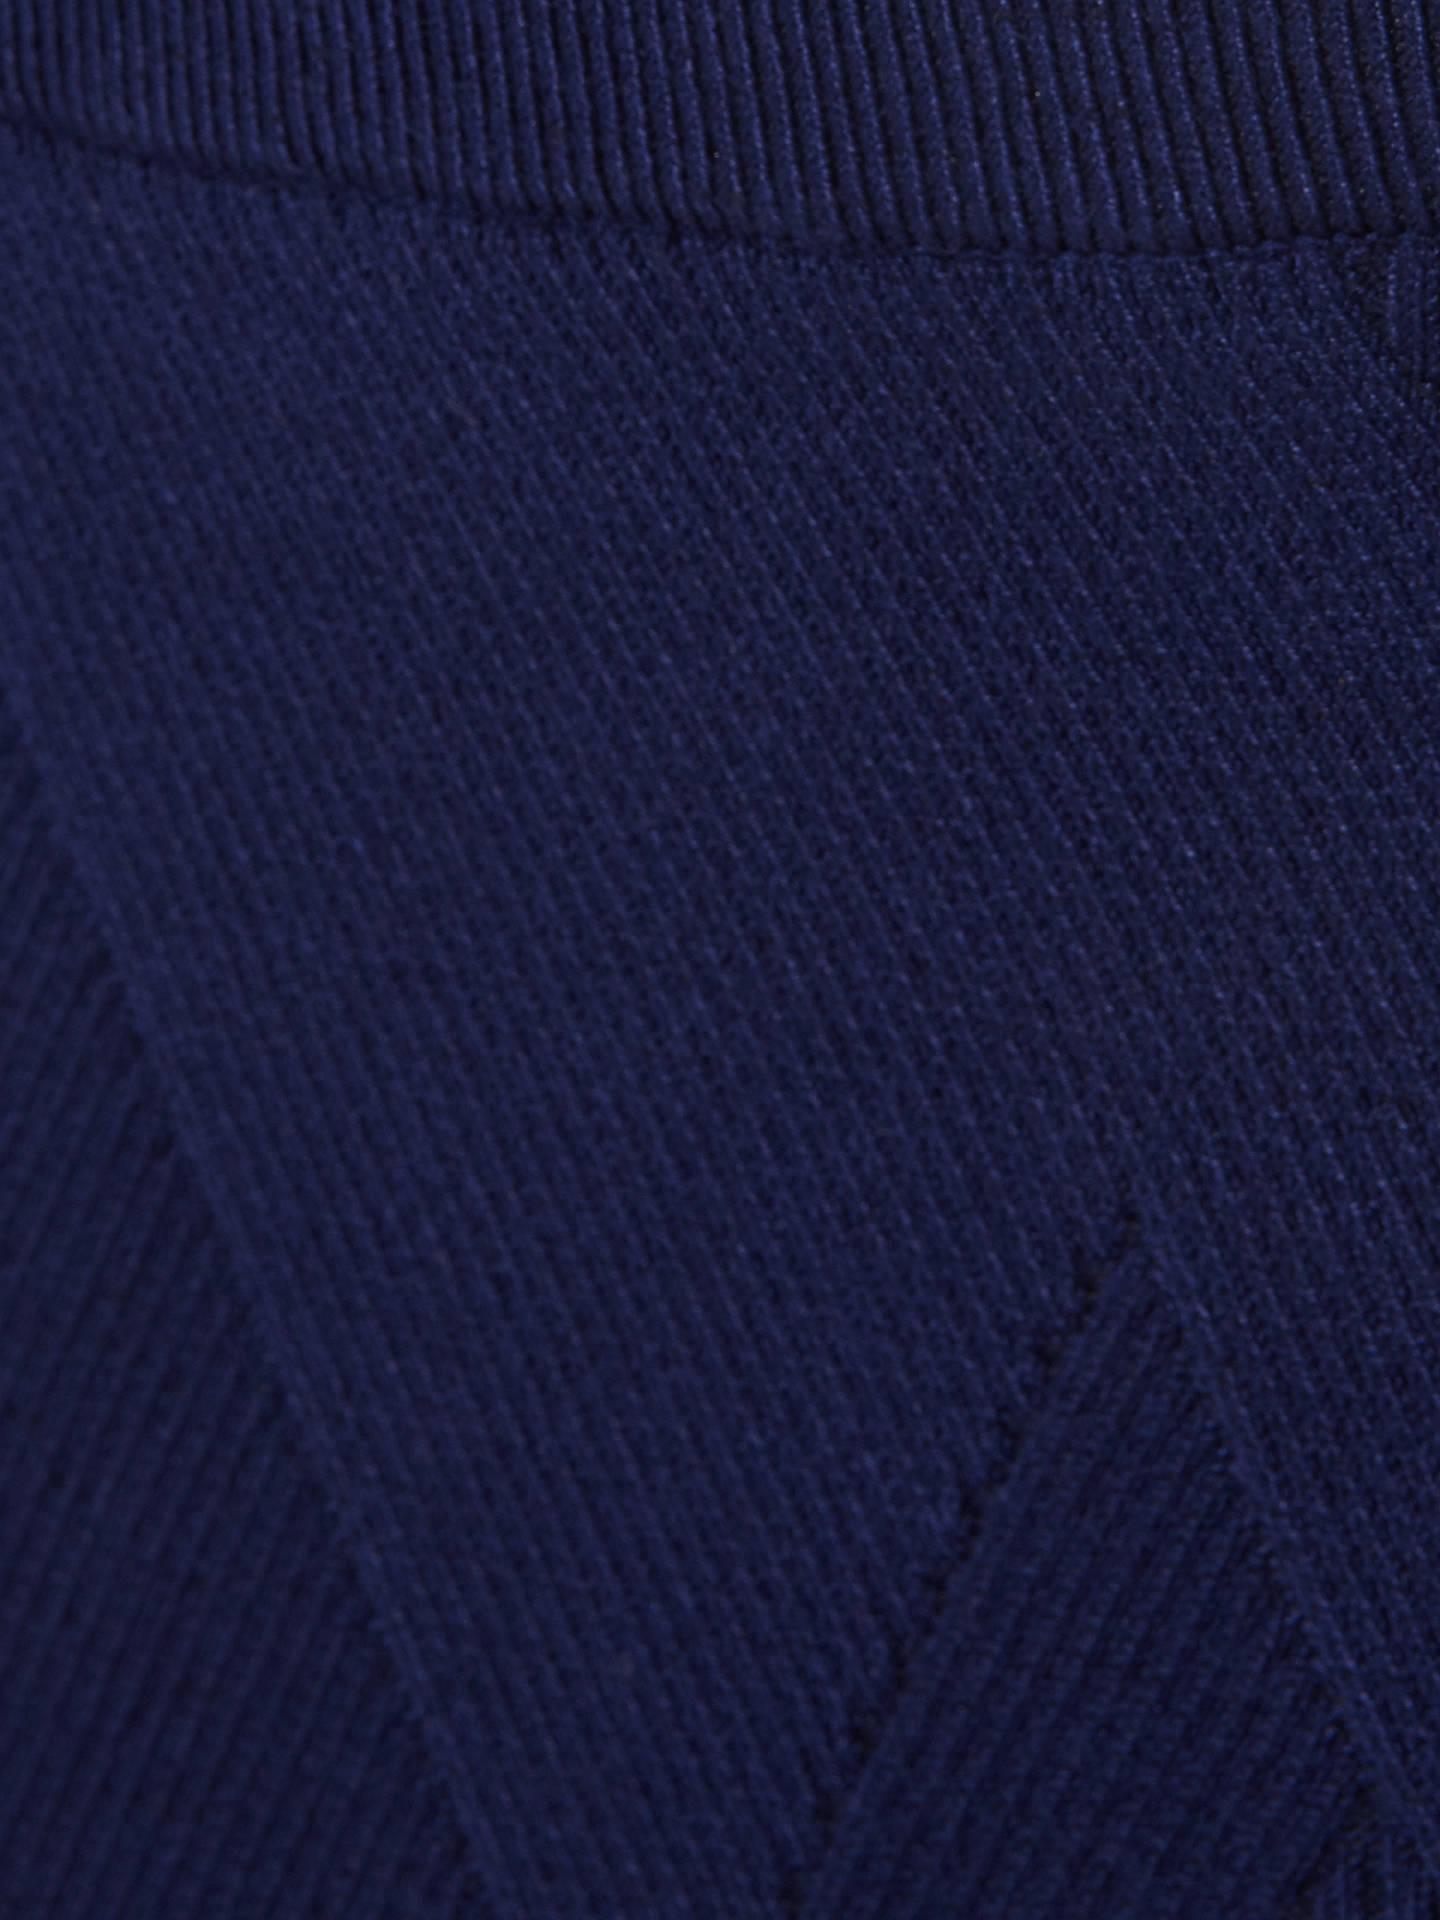 ec3224828767 ... Buy Phase Eight Georgina Grid Skirt, Ink, 16 Online at johnlewis.com